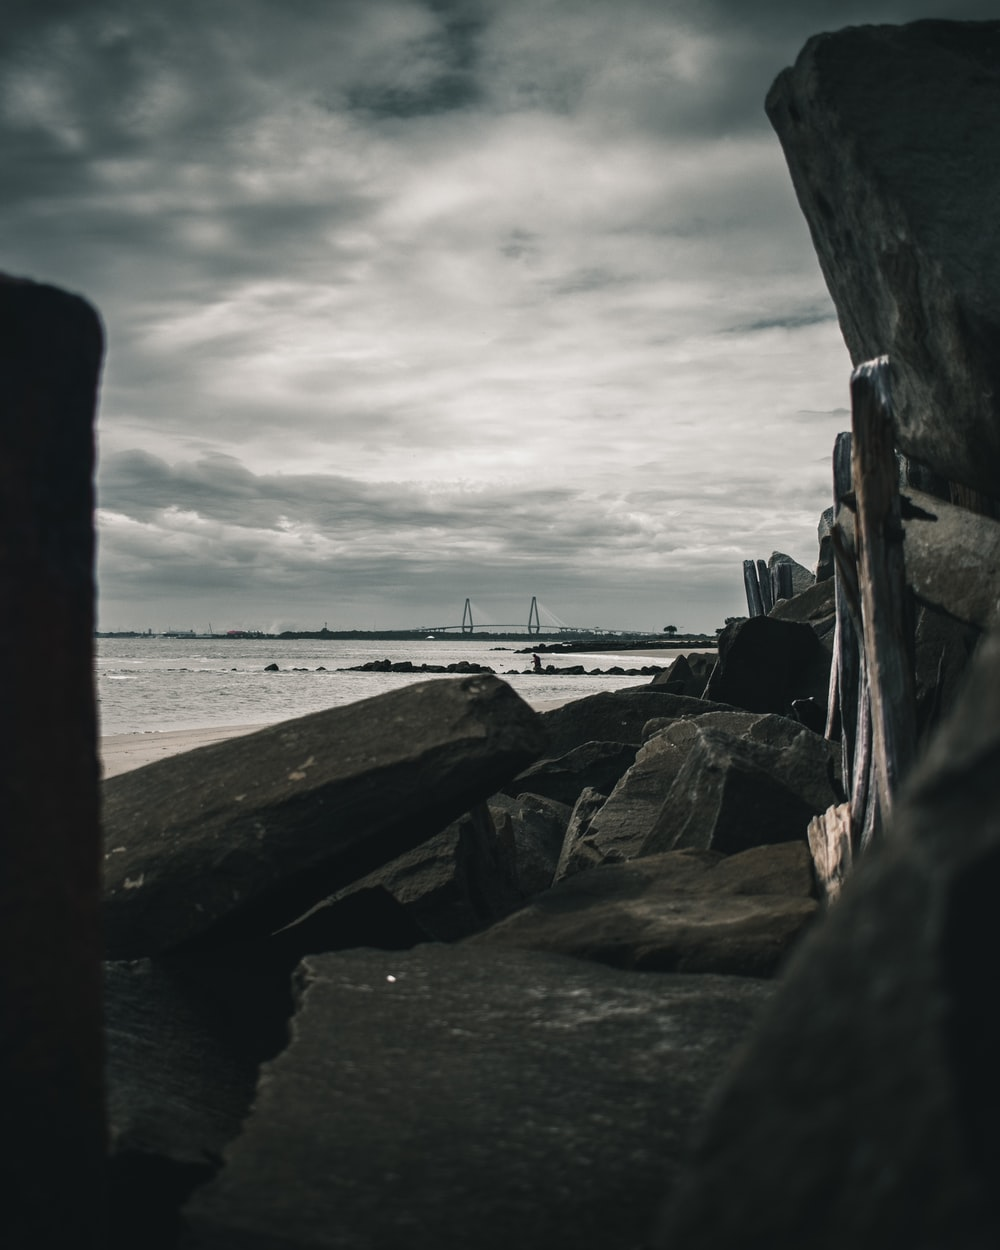 boulders facing ocean under cloudy sky